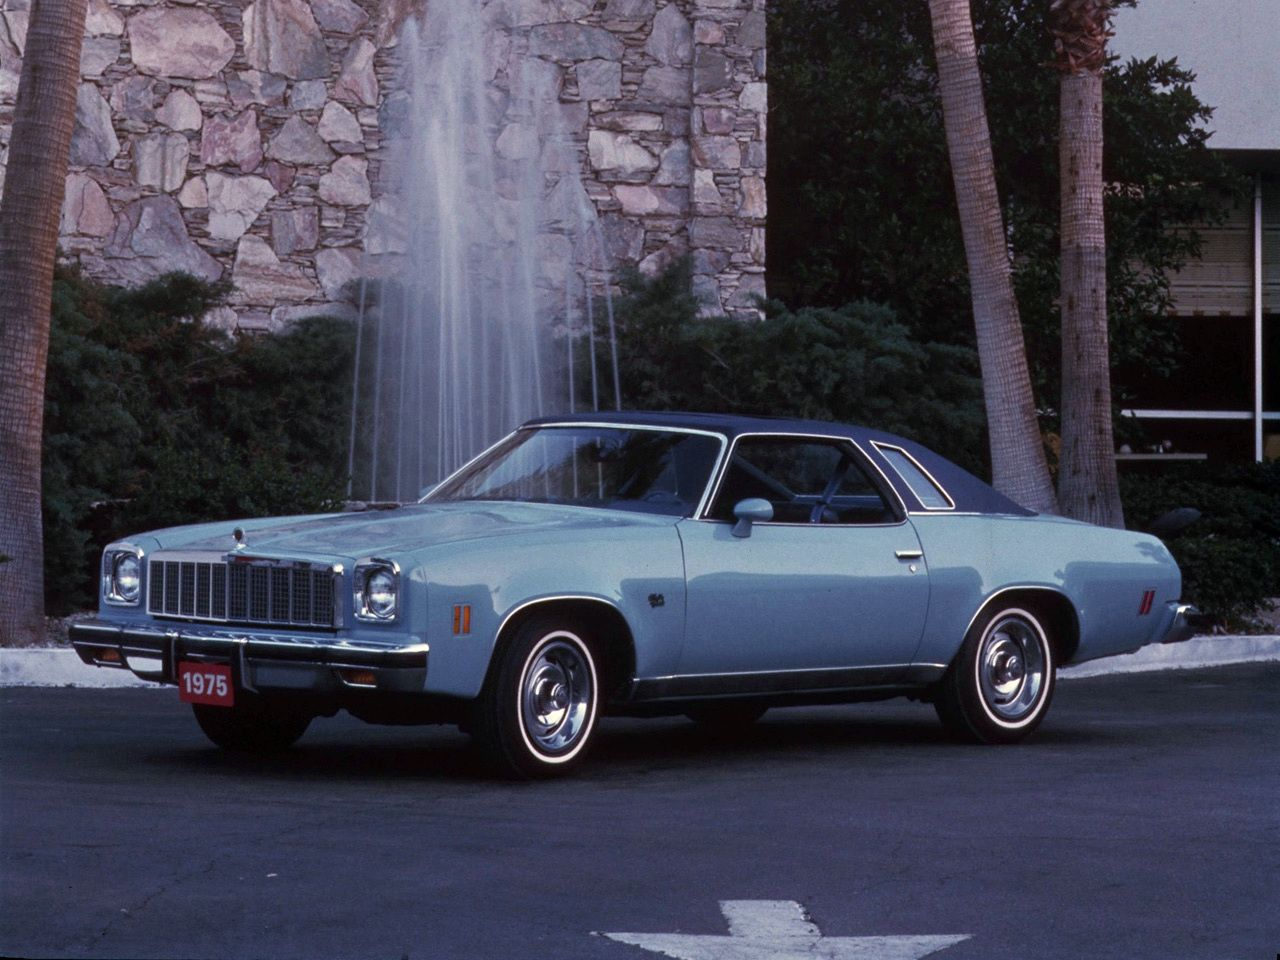 Malibu chevy classic malibu : 1975 Chevrolet Chevelle Malibu Sport Coupe | Chevrolet: 1973 ...